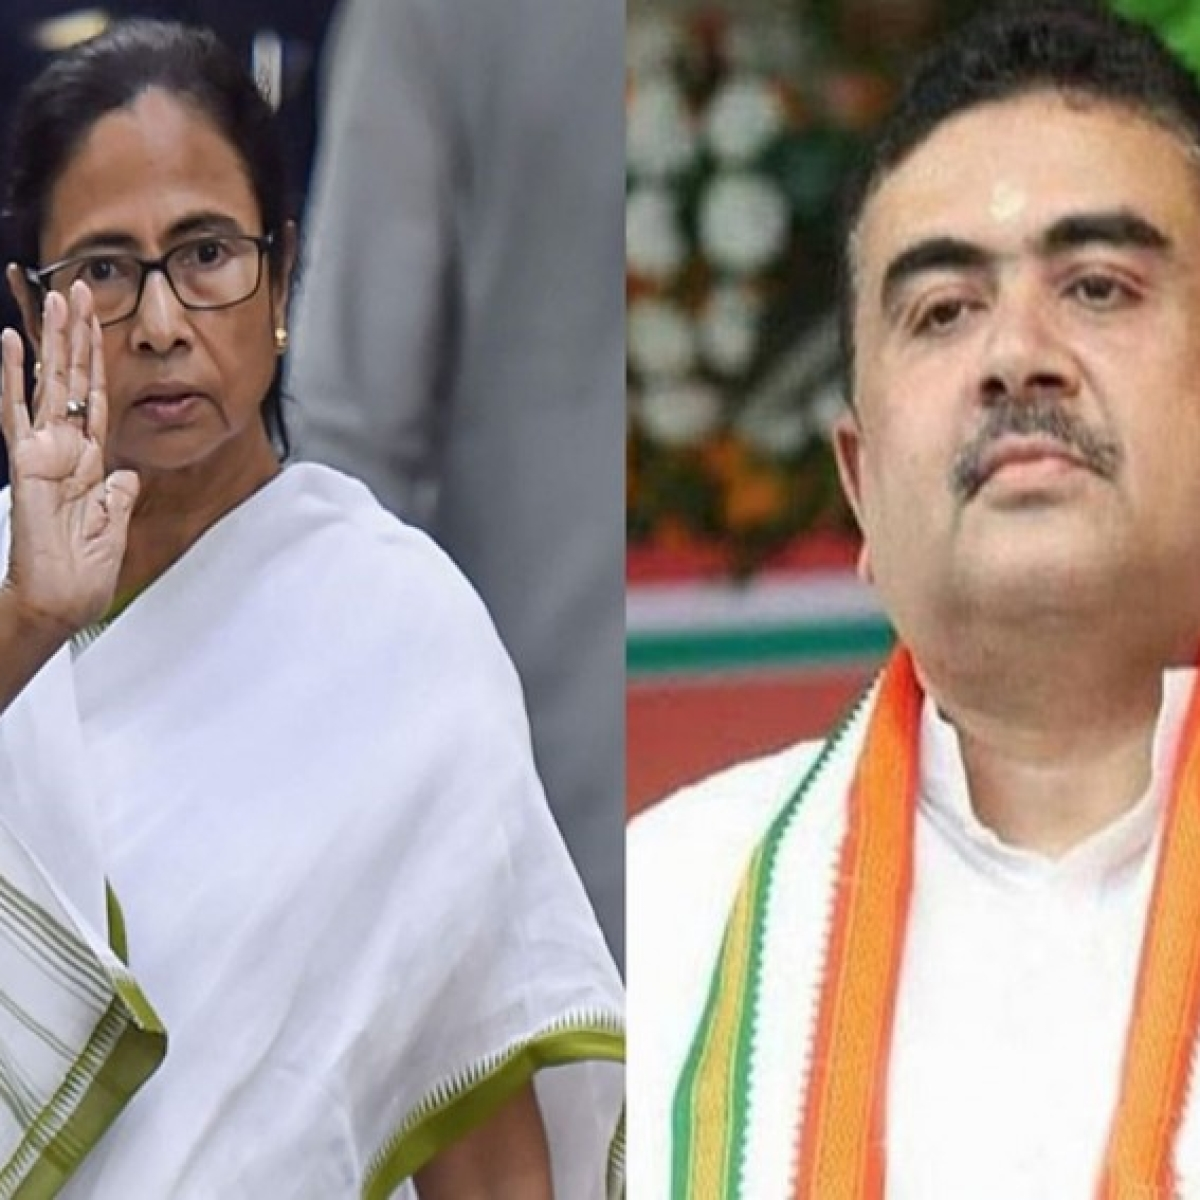 Nandigram: Mamata Banerjee or Suvendu Adhikari - Who will win the biggest battle of egos?